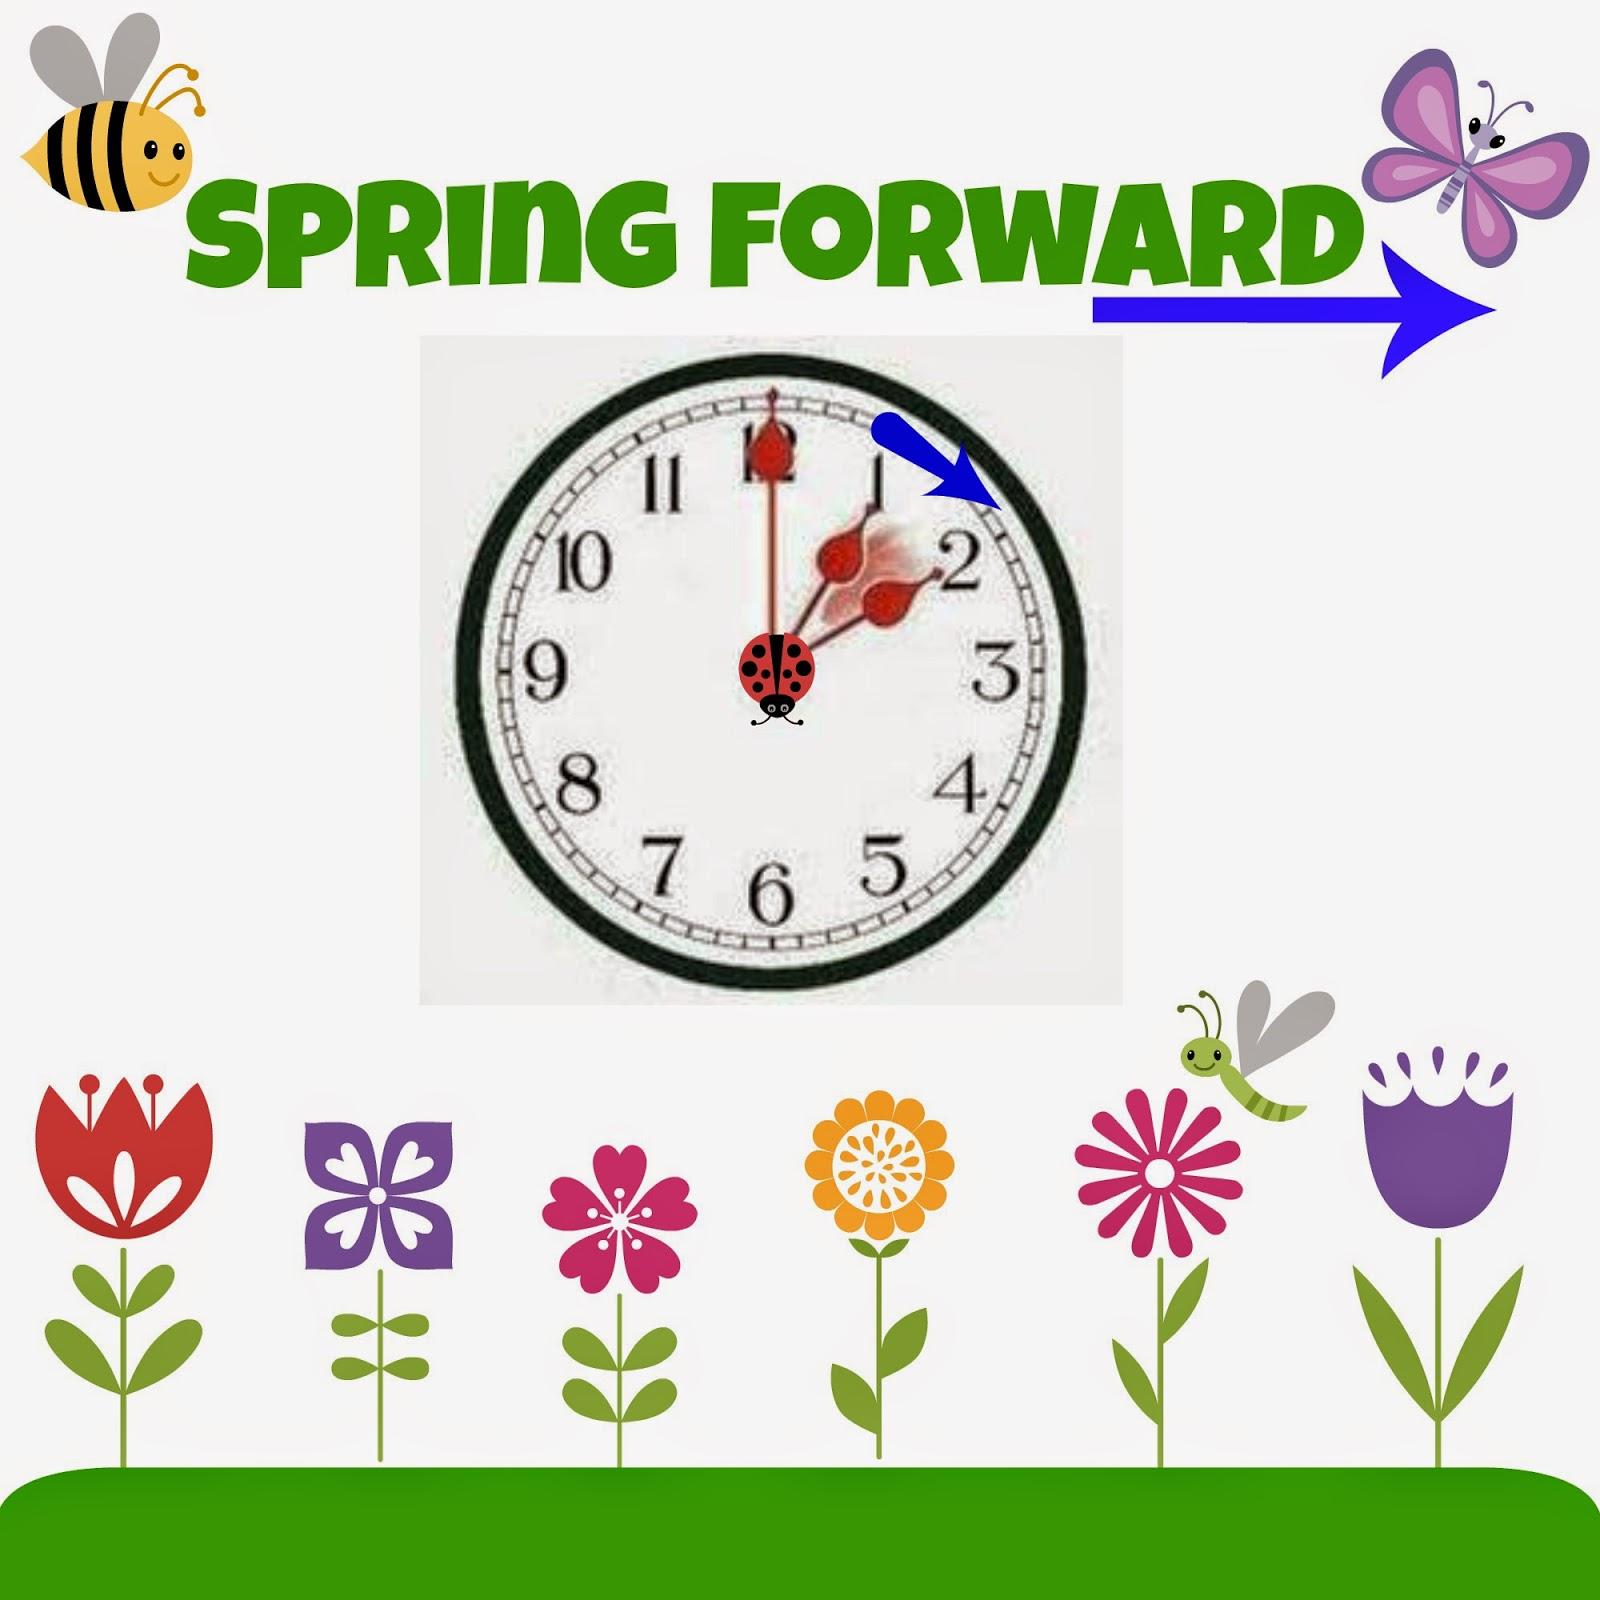 daylight savings baby sleep tips, spring forward baby sleep tips, time change baby sleep tips